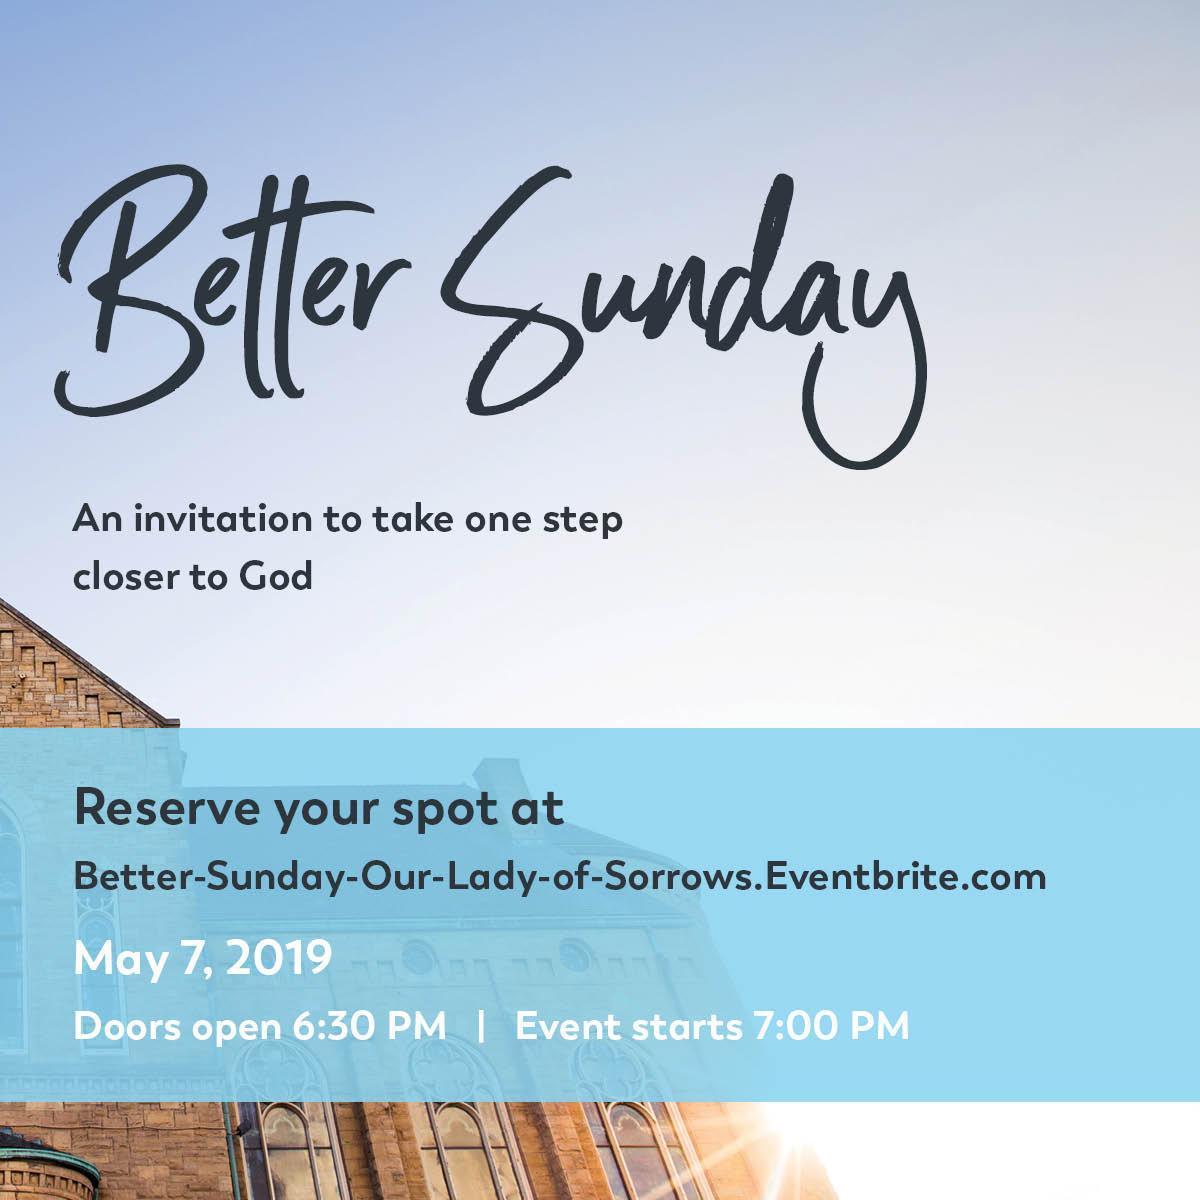 Better Sunday